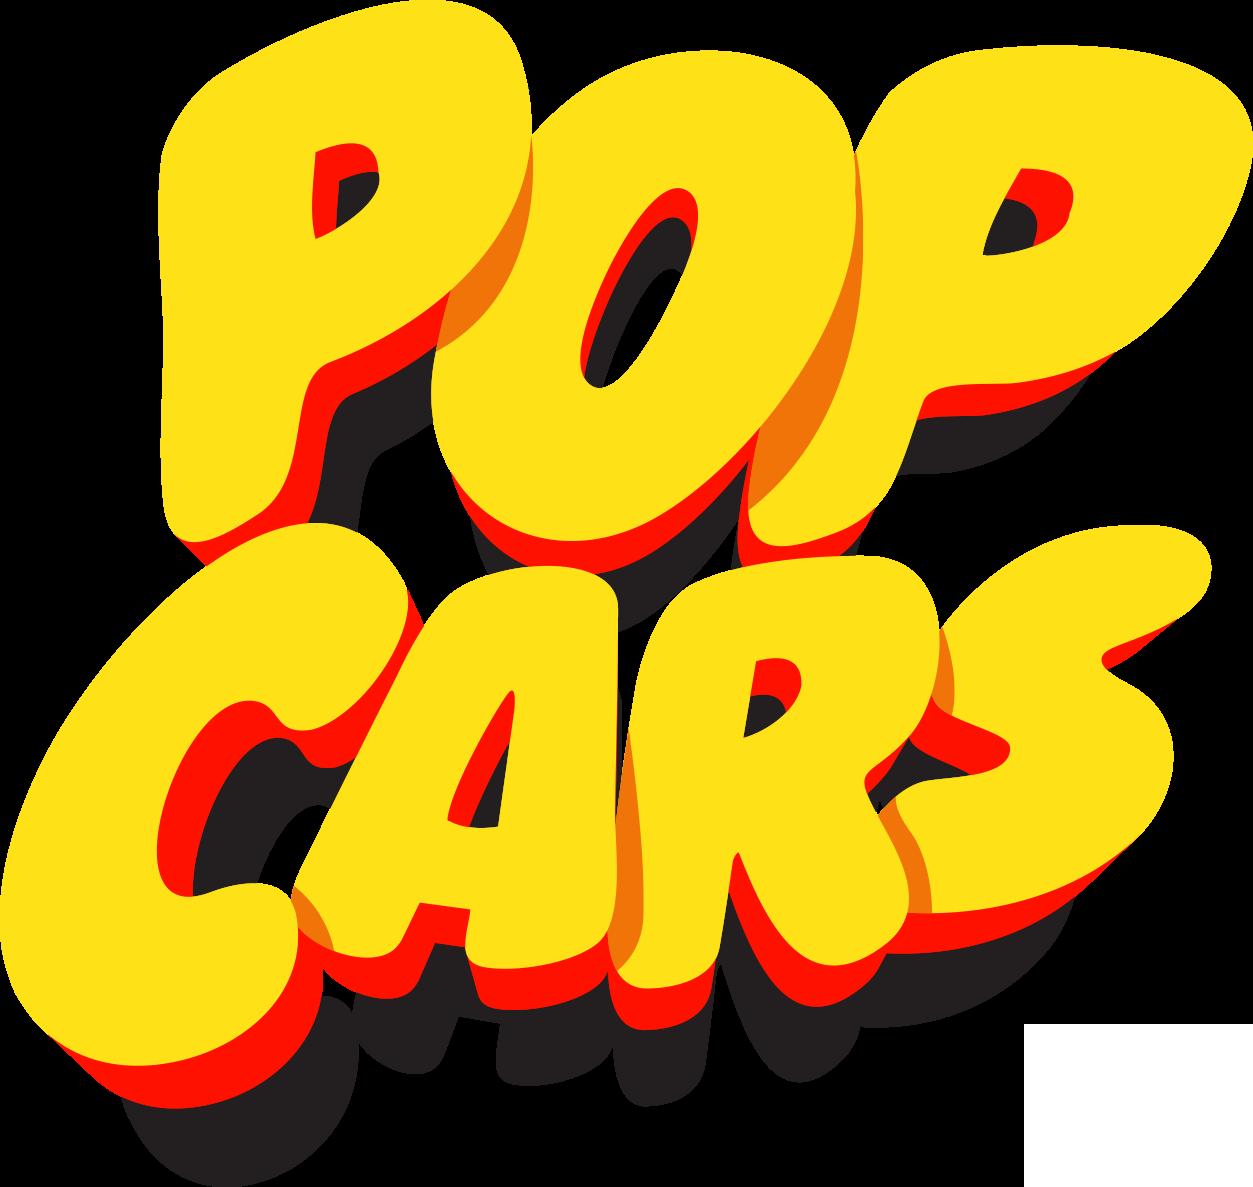 popcarslogo.png